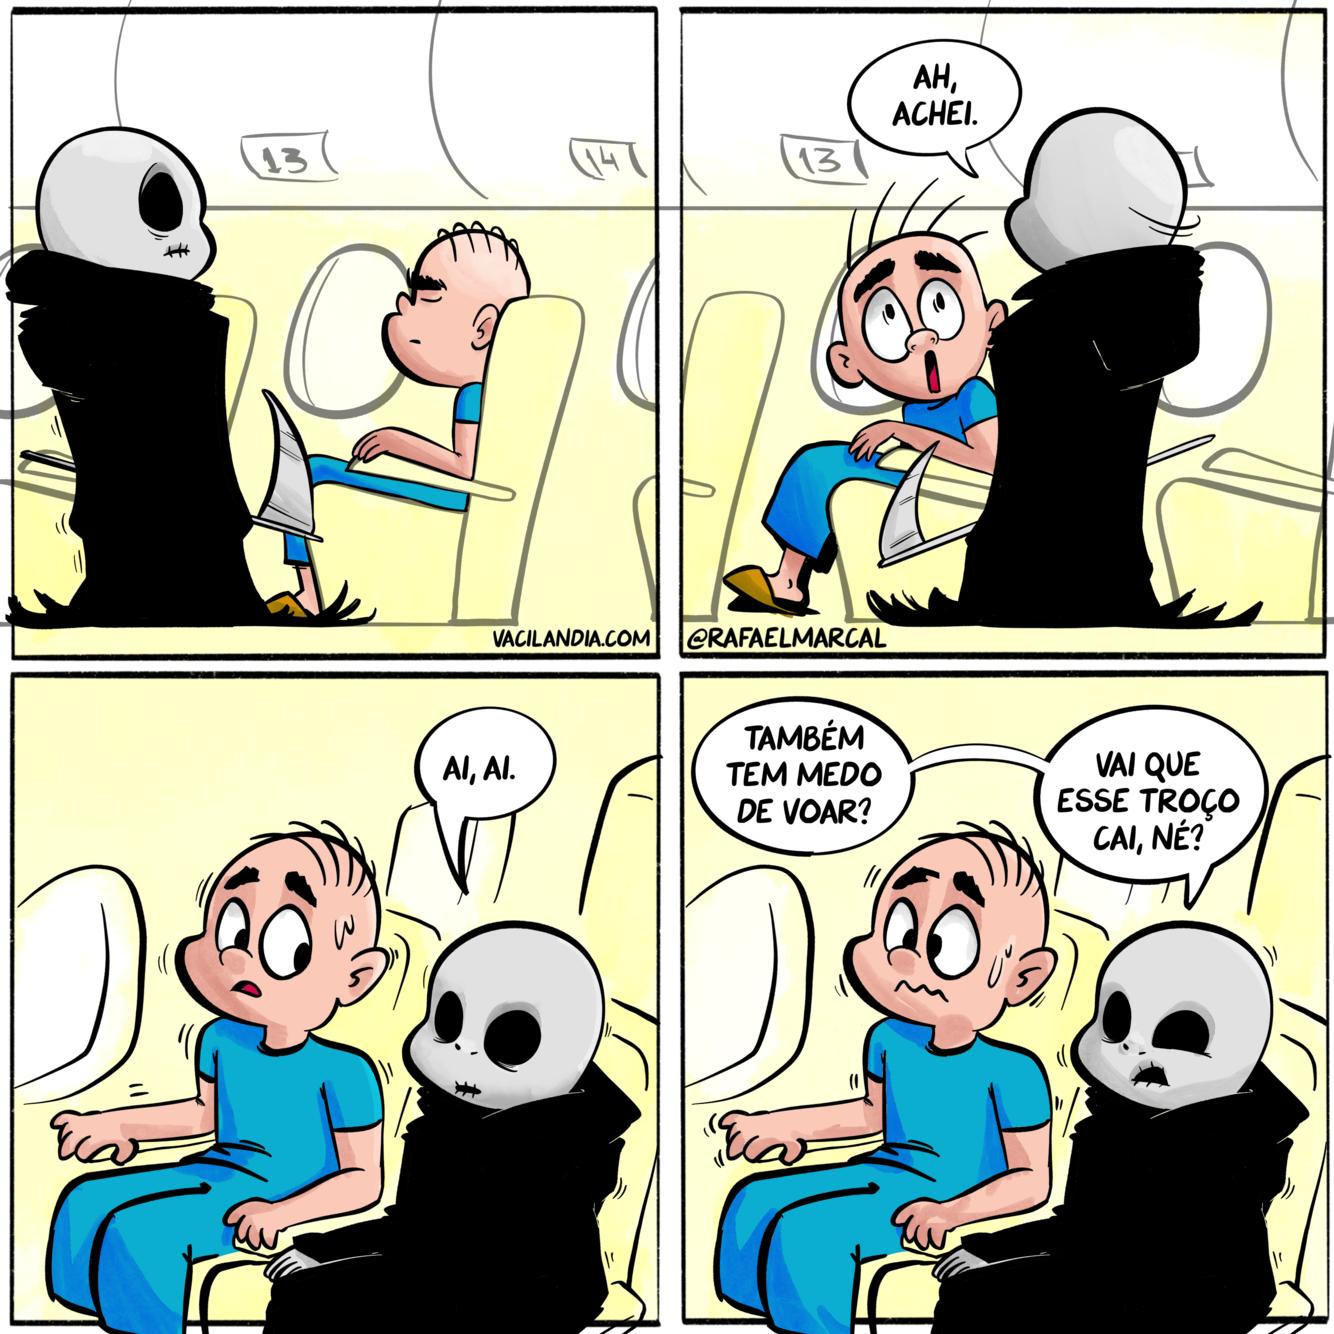 Morte Bocó | webcomic, voar, tirinha, Morte Bocó, morte, medo, humor